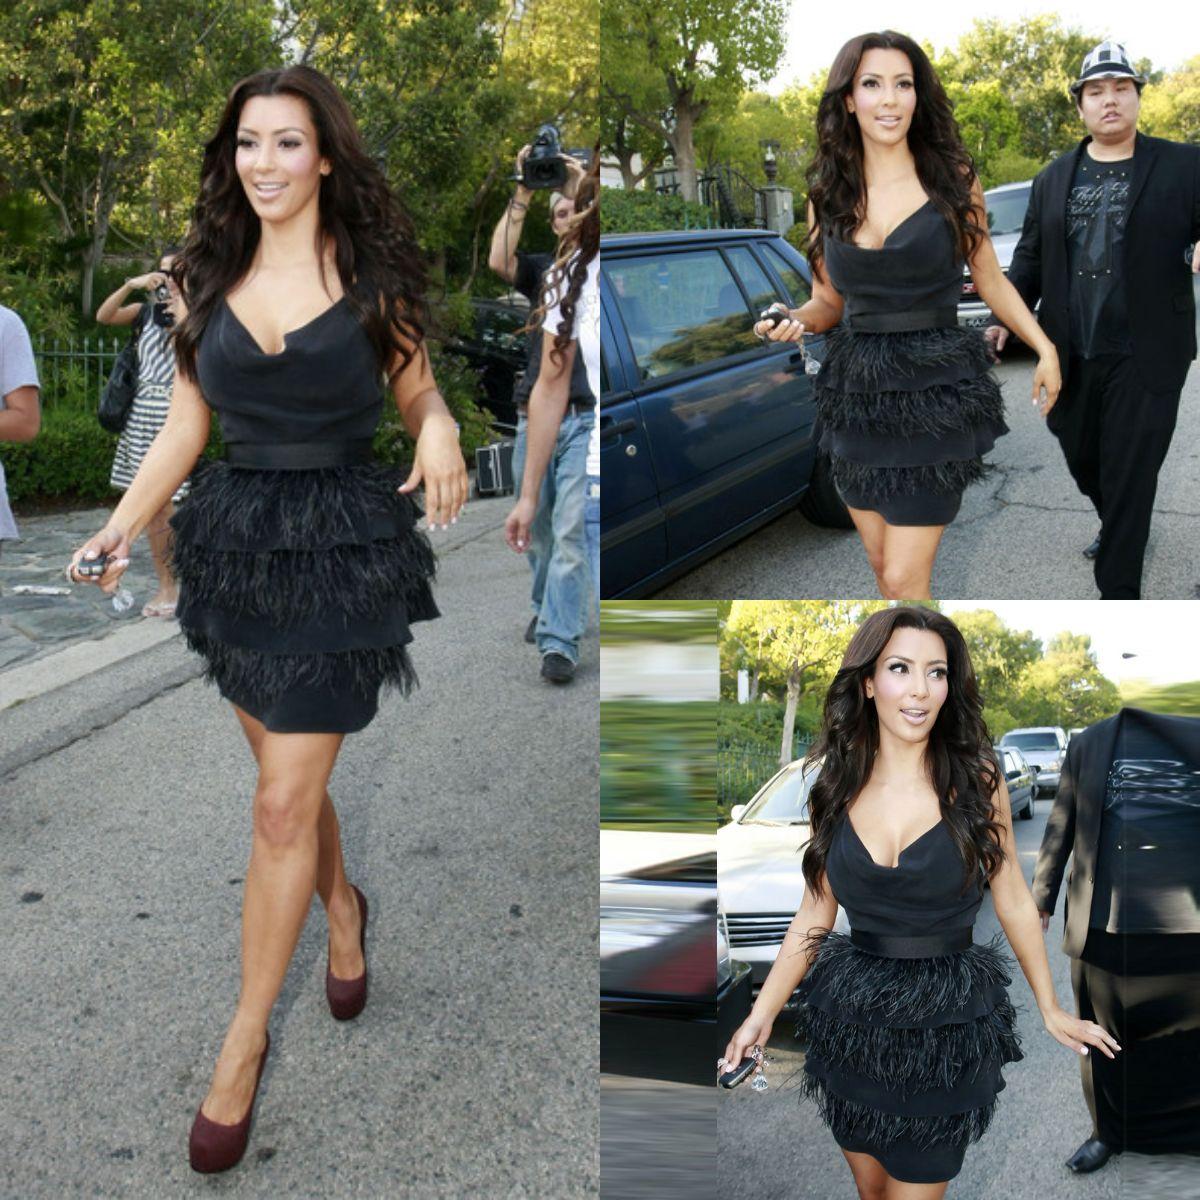 Kim Kardashian Black Short Prom Dresses Sweetheart Knee Length Corset Formal Party evening Gown Elegant Red Carpet Inspired Prom with fringe